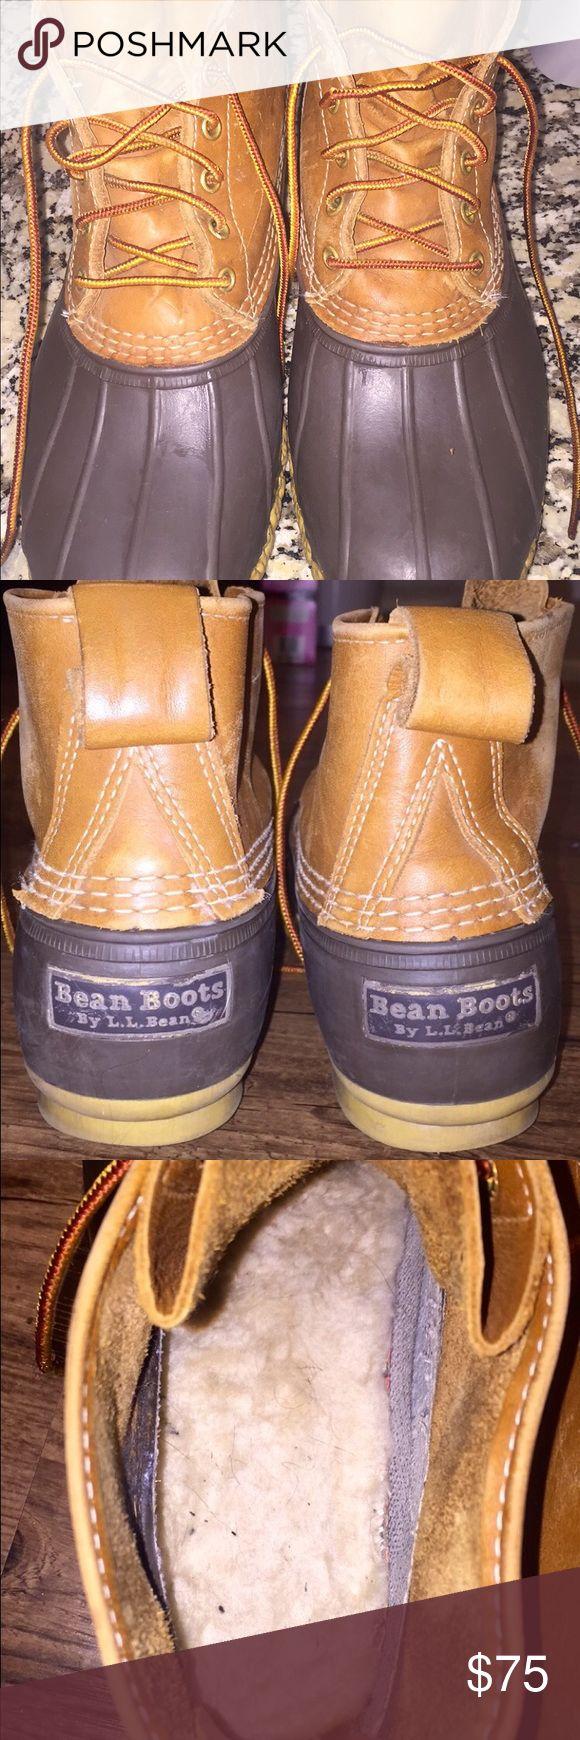 L l bean order form - Bean Boots Ll Bean Boots Mens Size 9 Fit A 10 5 11 Include